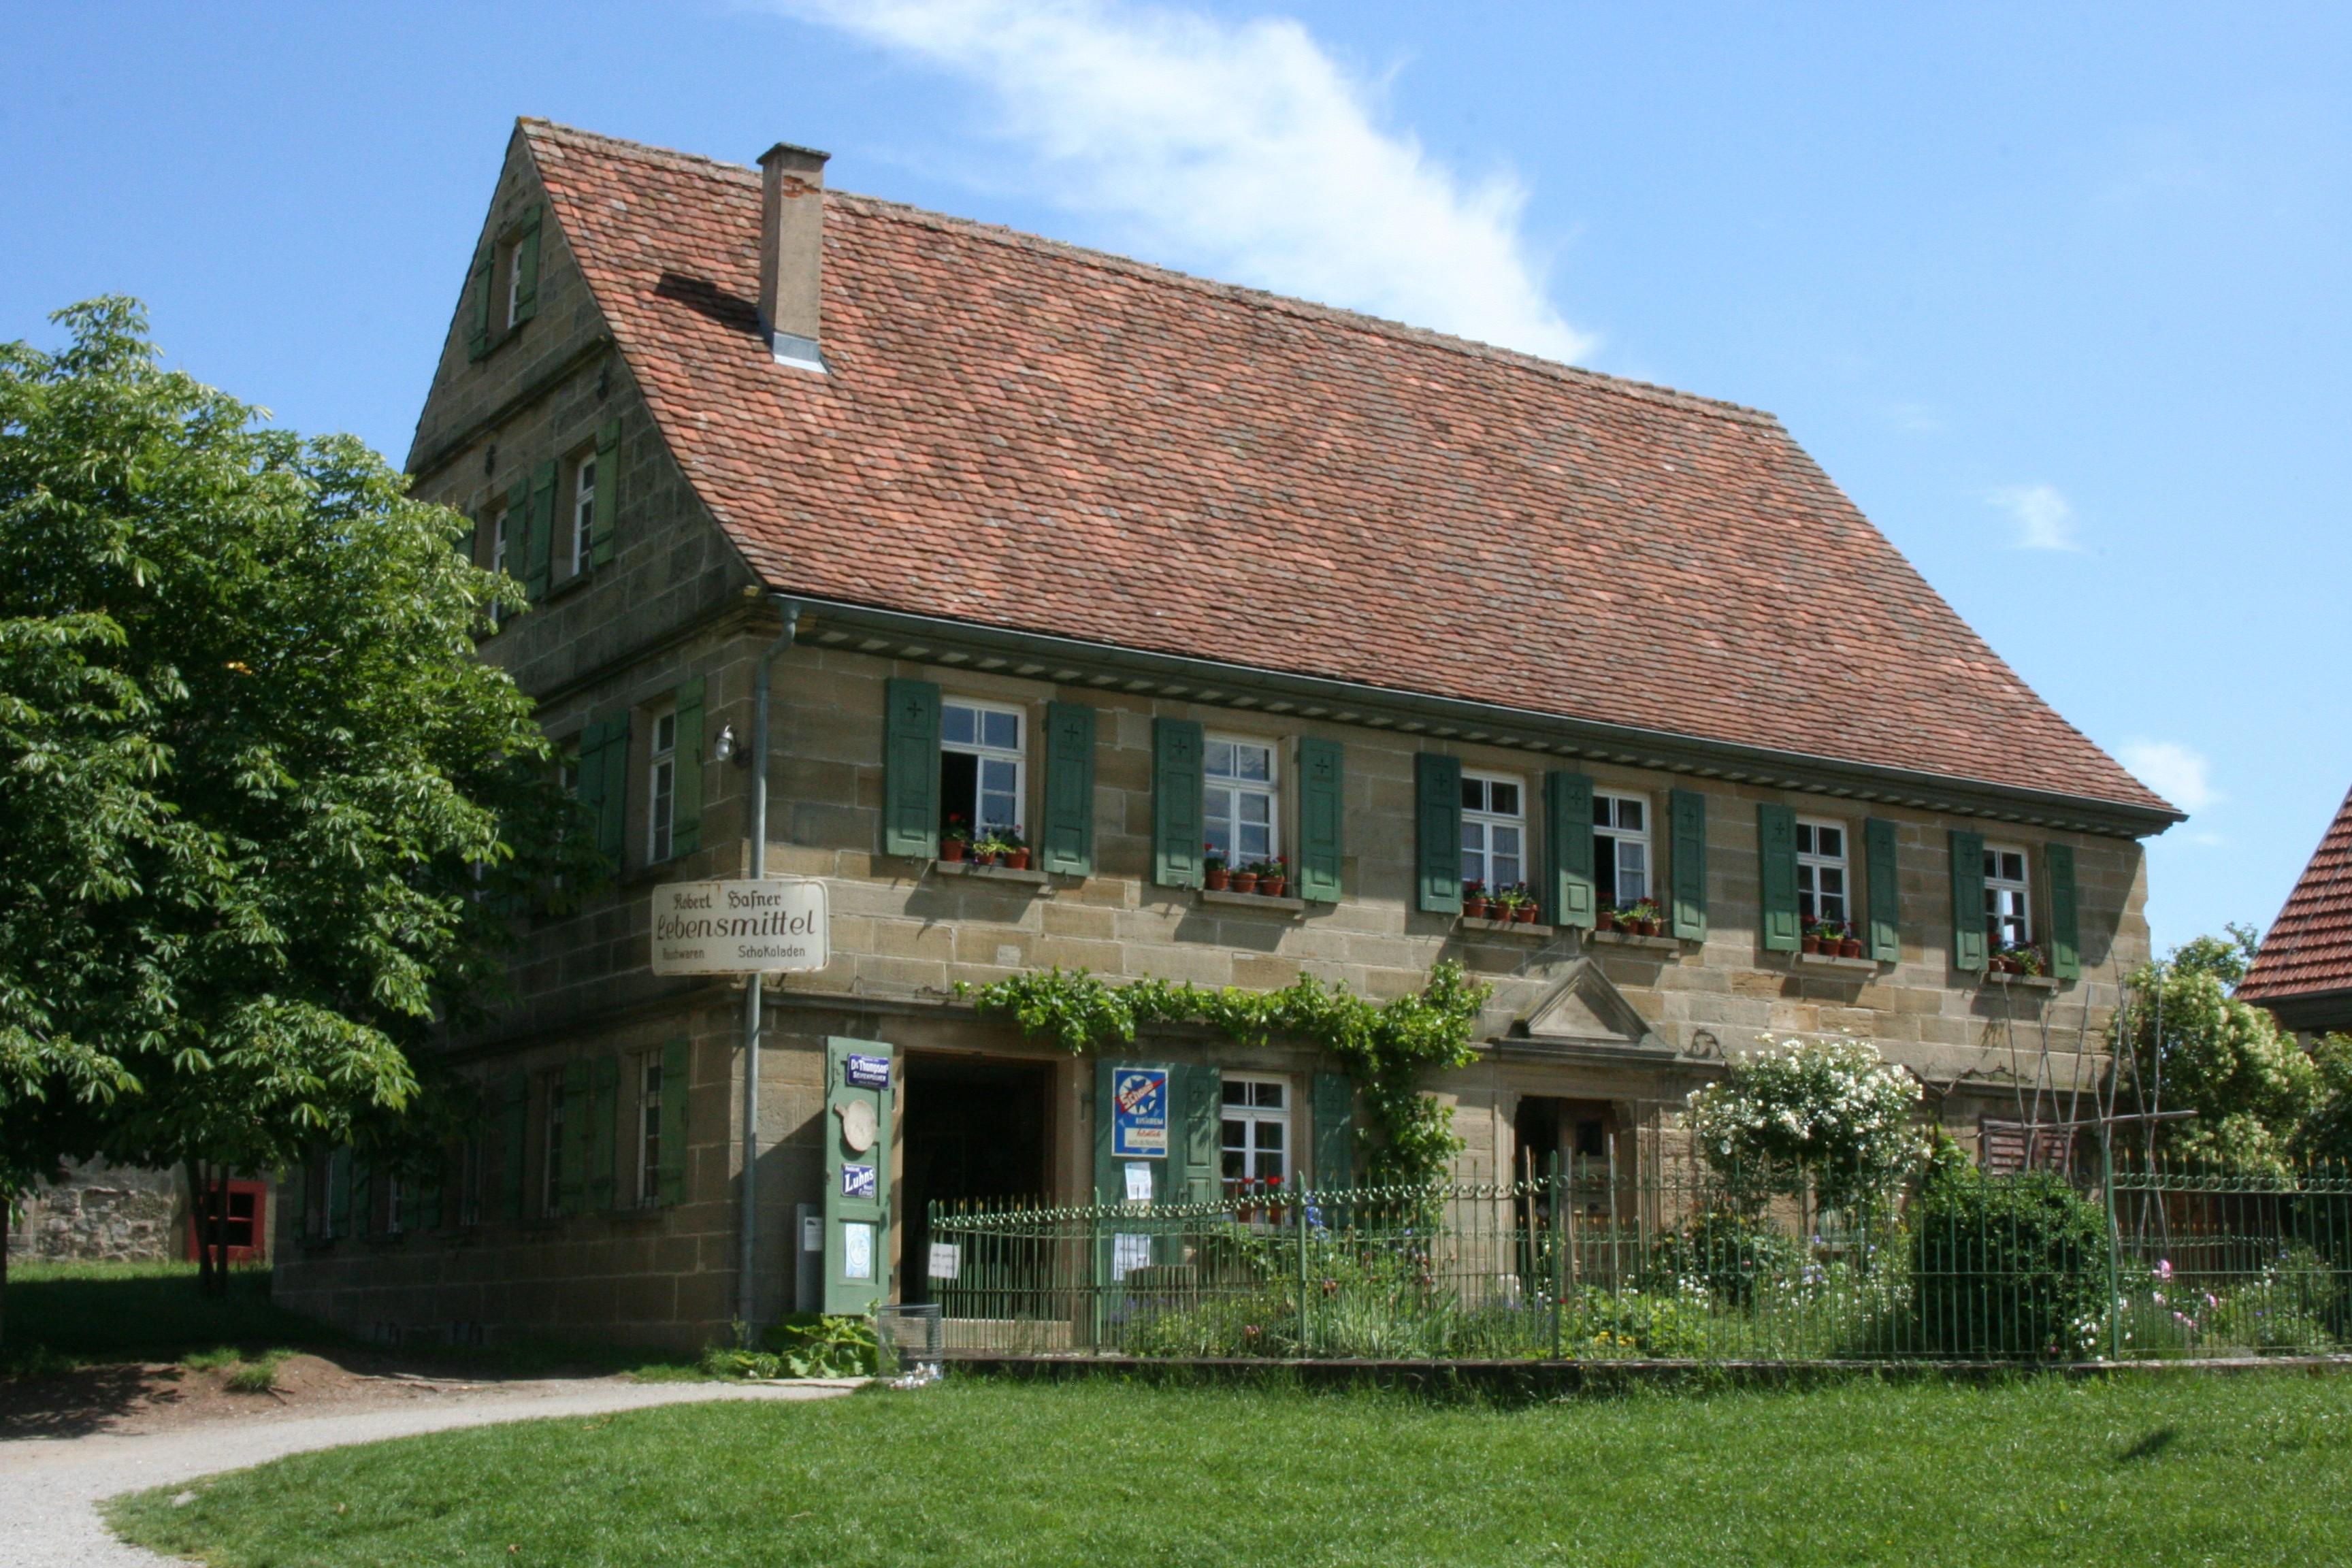 Filewackershofen freilandmuseum wohn stall haus schoenenberg 20070530